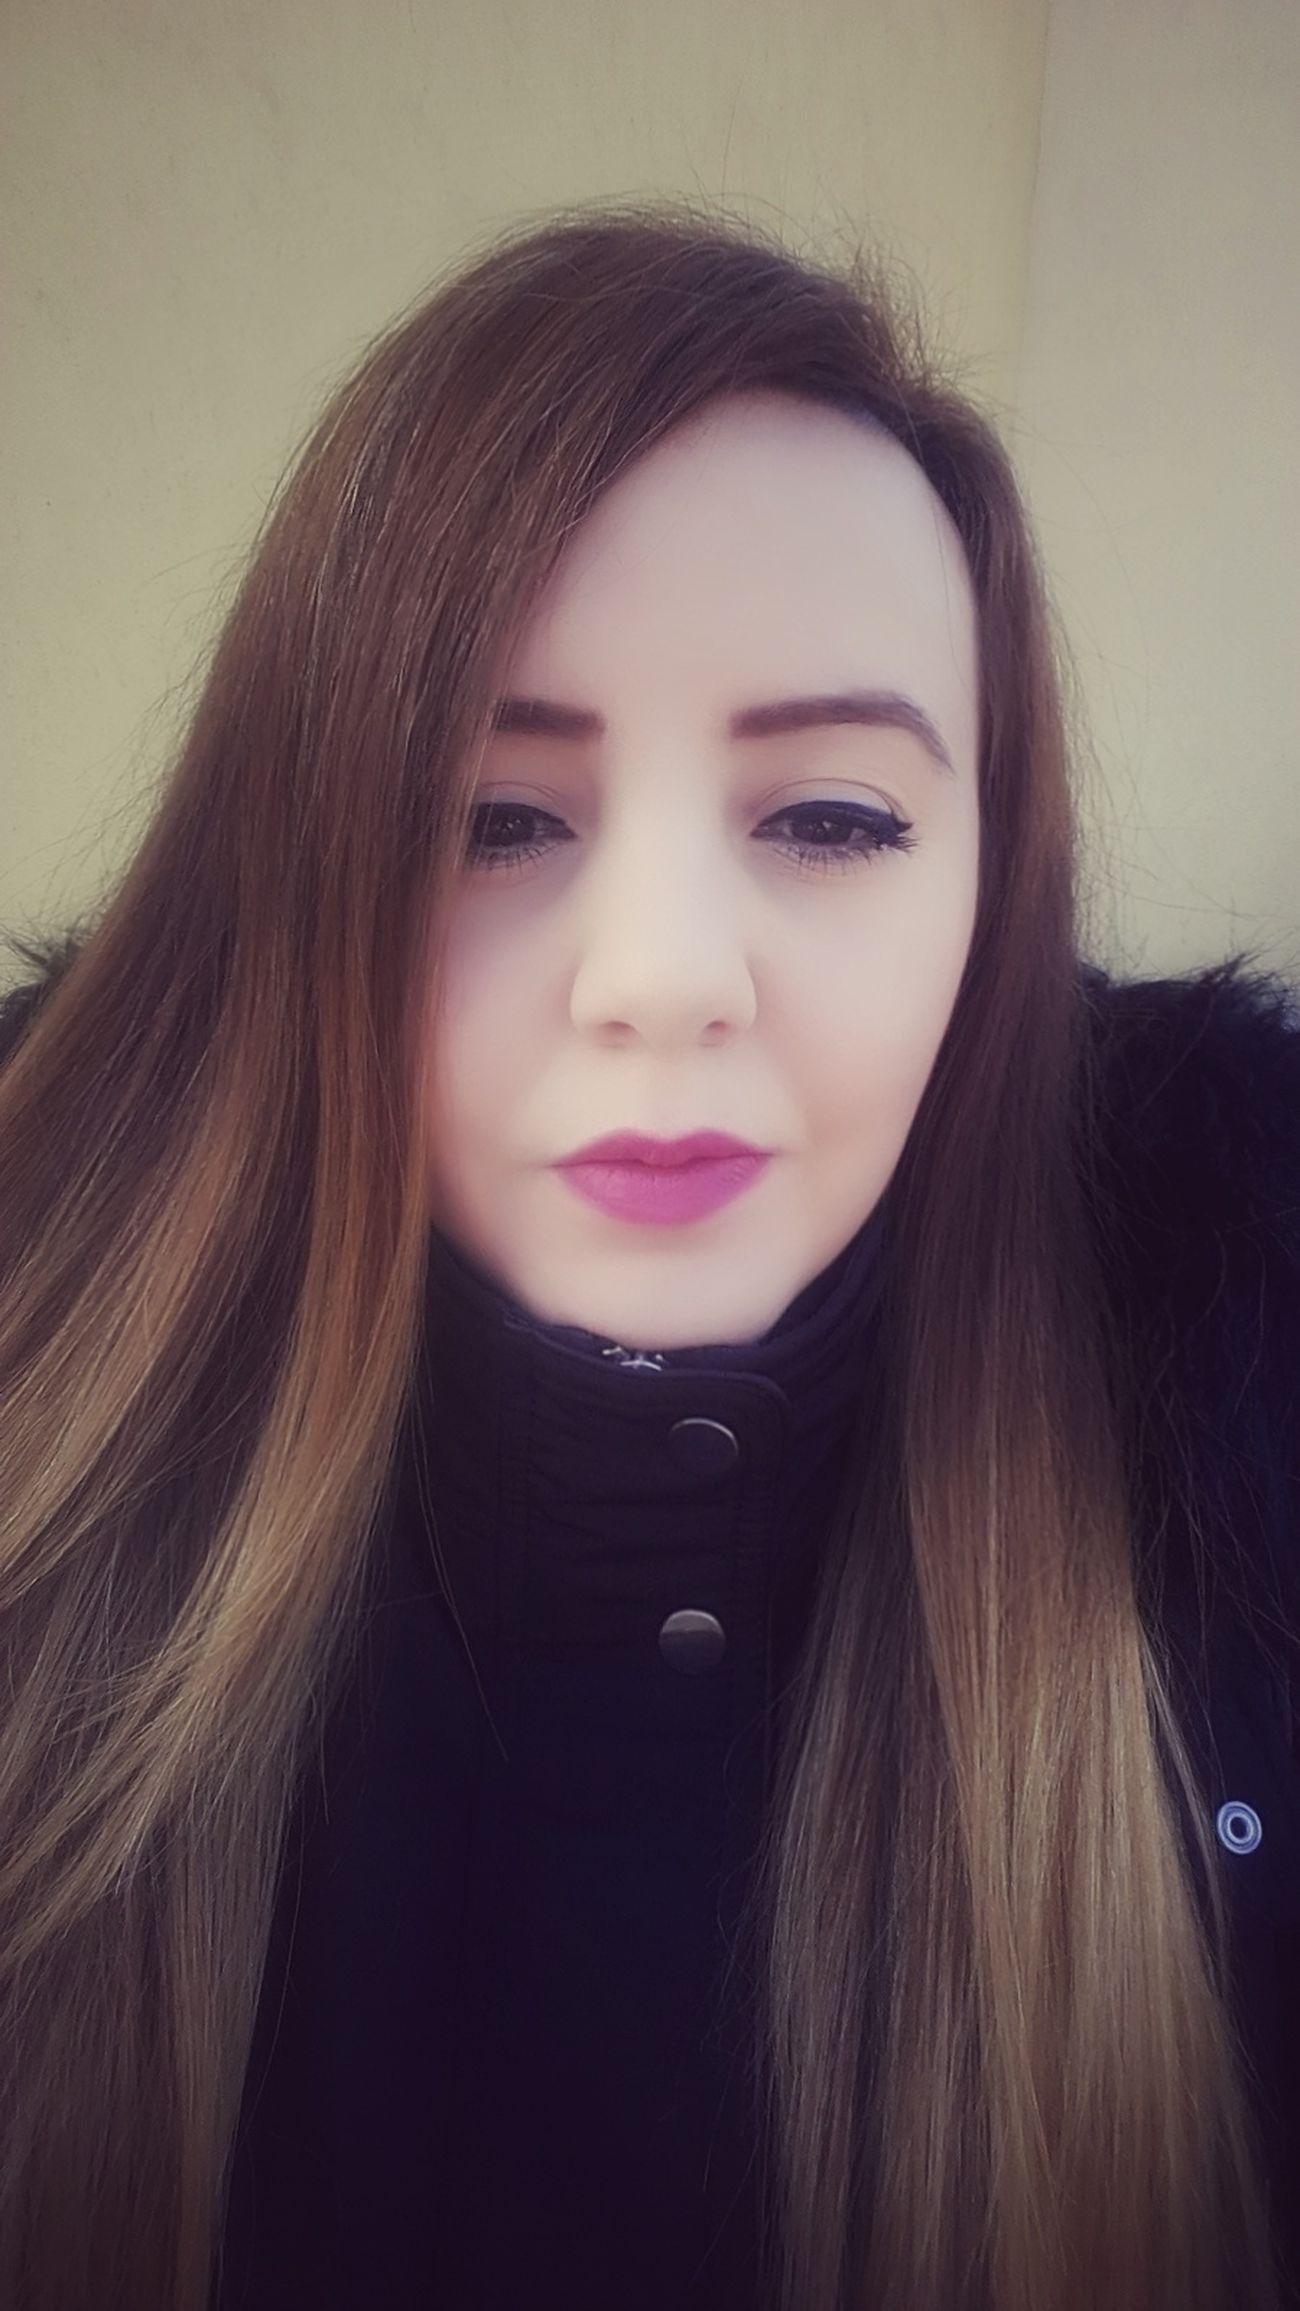 purple😗 Purple Purple Lipstick Pink Lipstick  Beautiful Woman Human Lips Smiling Long Hair Beautiful People Front View Portrait Close-up Only Women The Week On Eyem Nature Women First Eyeem Photo Eyemphotos Beauty In Nature Eyemphotography EyeEm Best Shots Eye Em Nature Lover My Favorite Photo Selfie ✌ Eyeem Market Women Of EyeEm